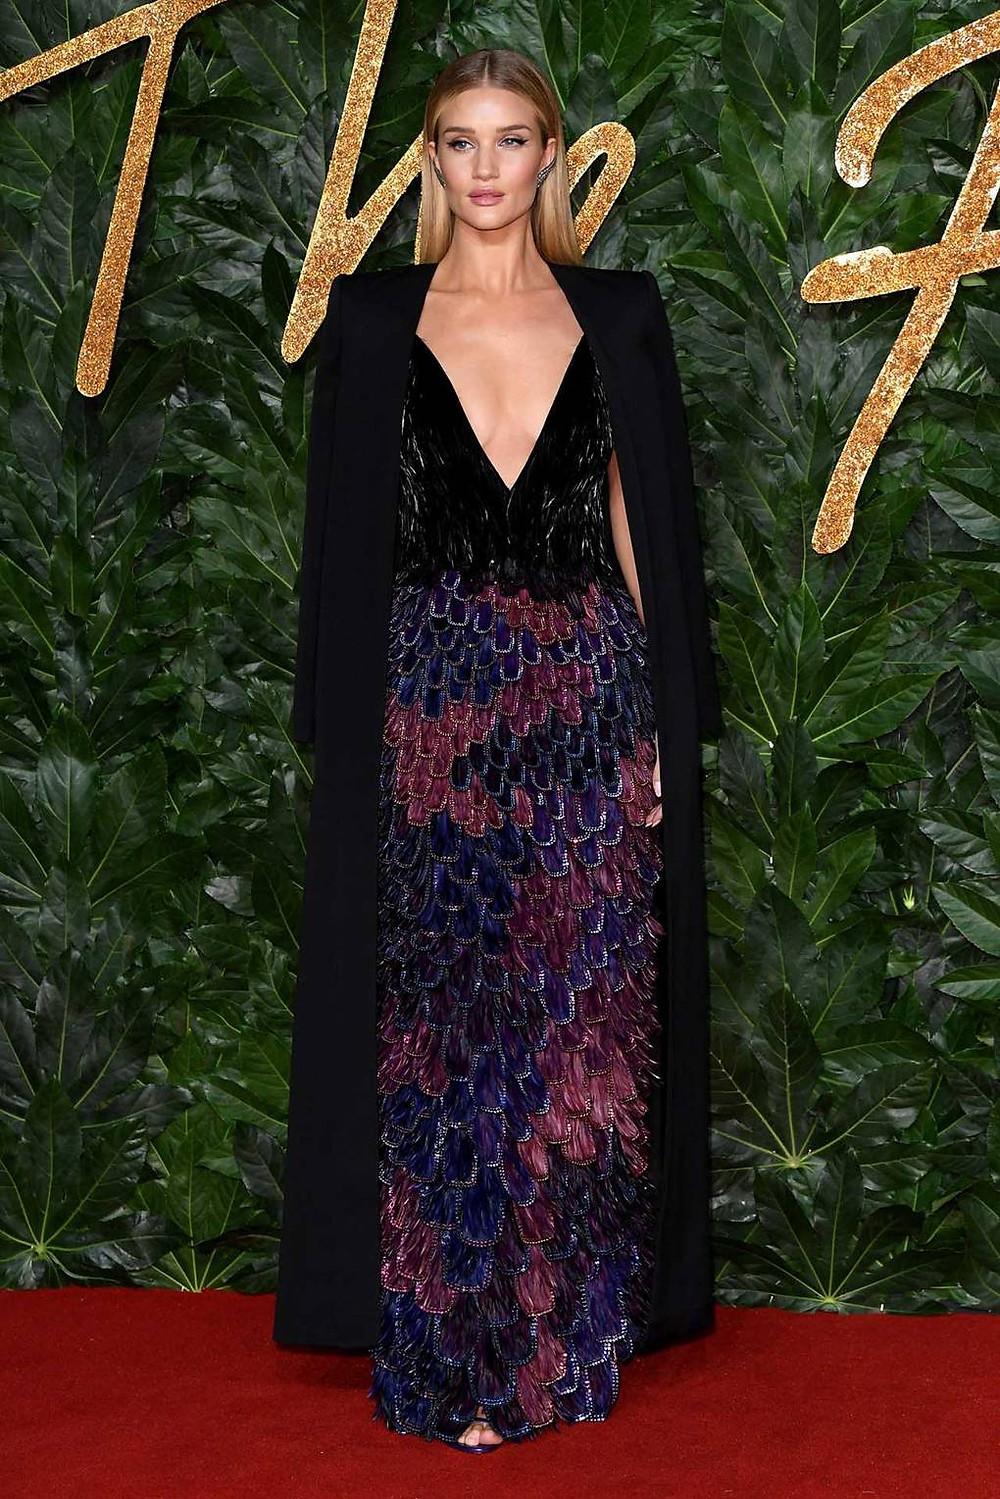 Rosie Huntington-Whiteley in Givenchy.